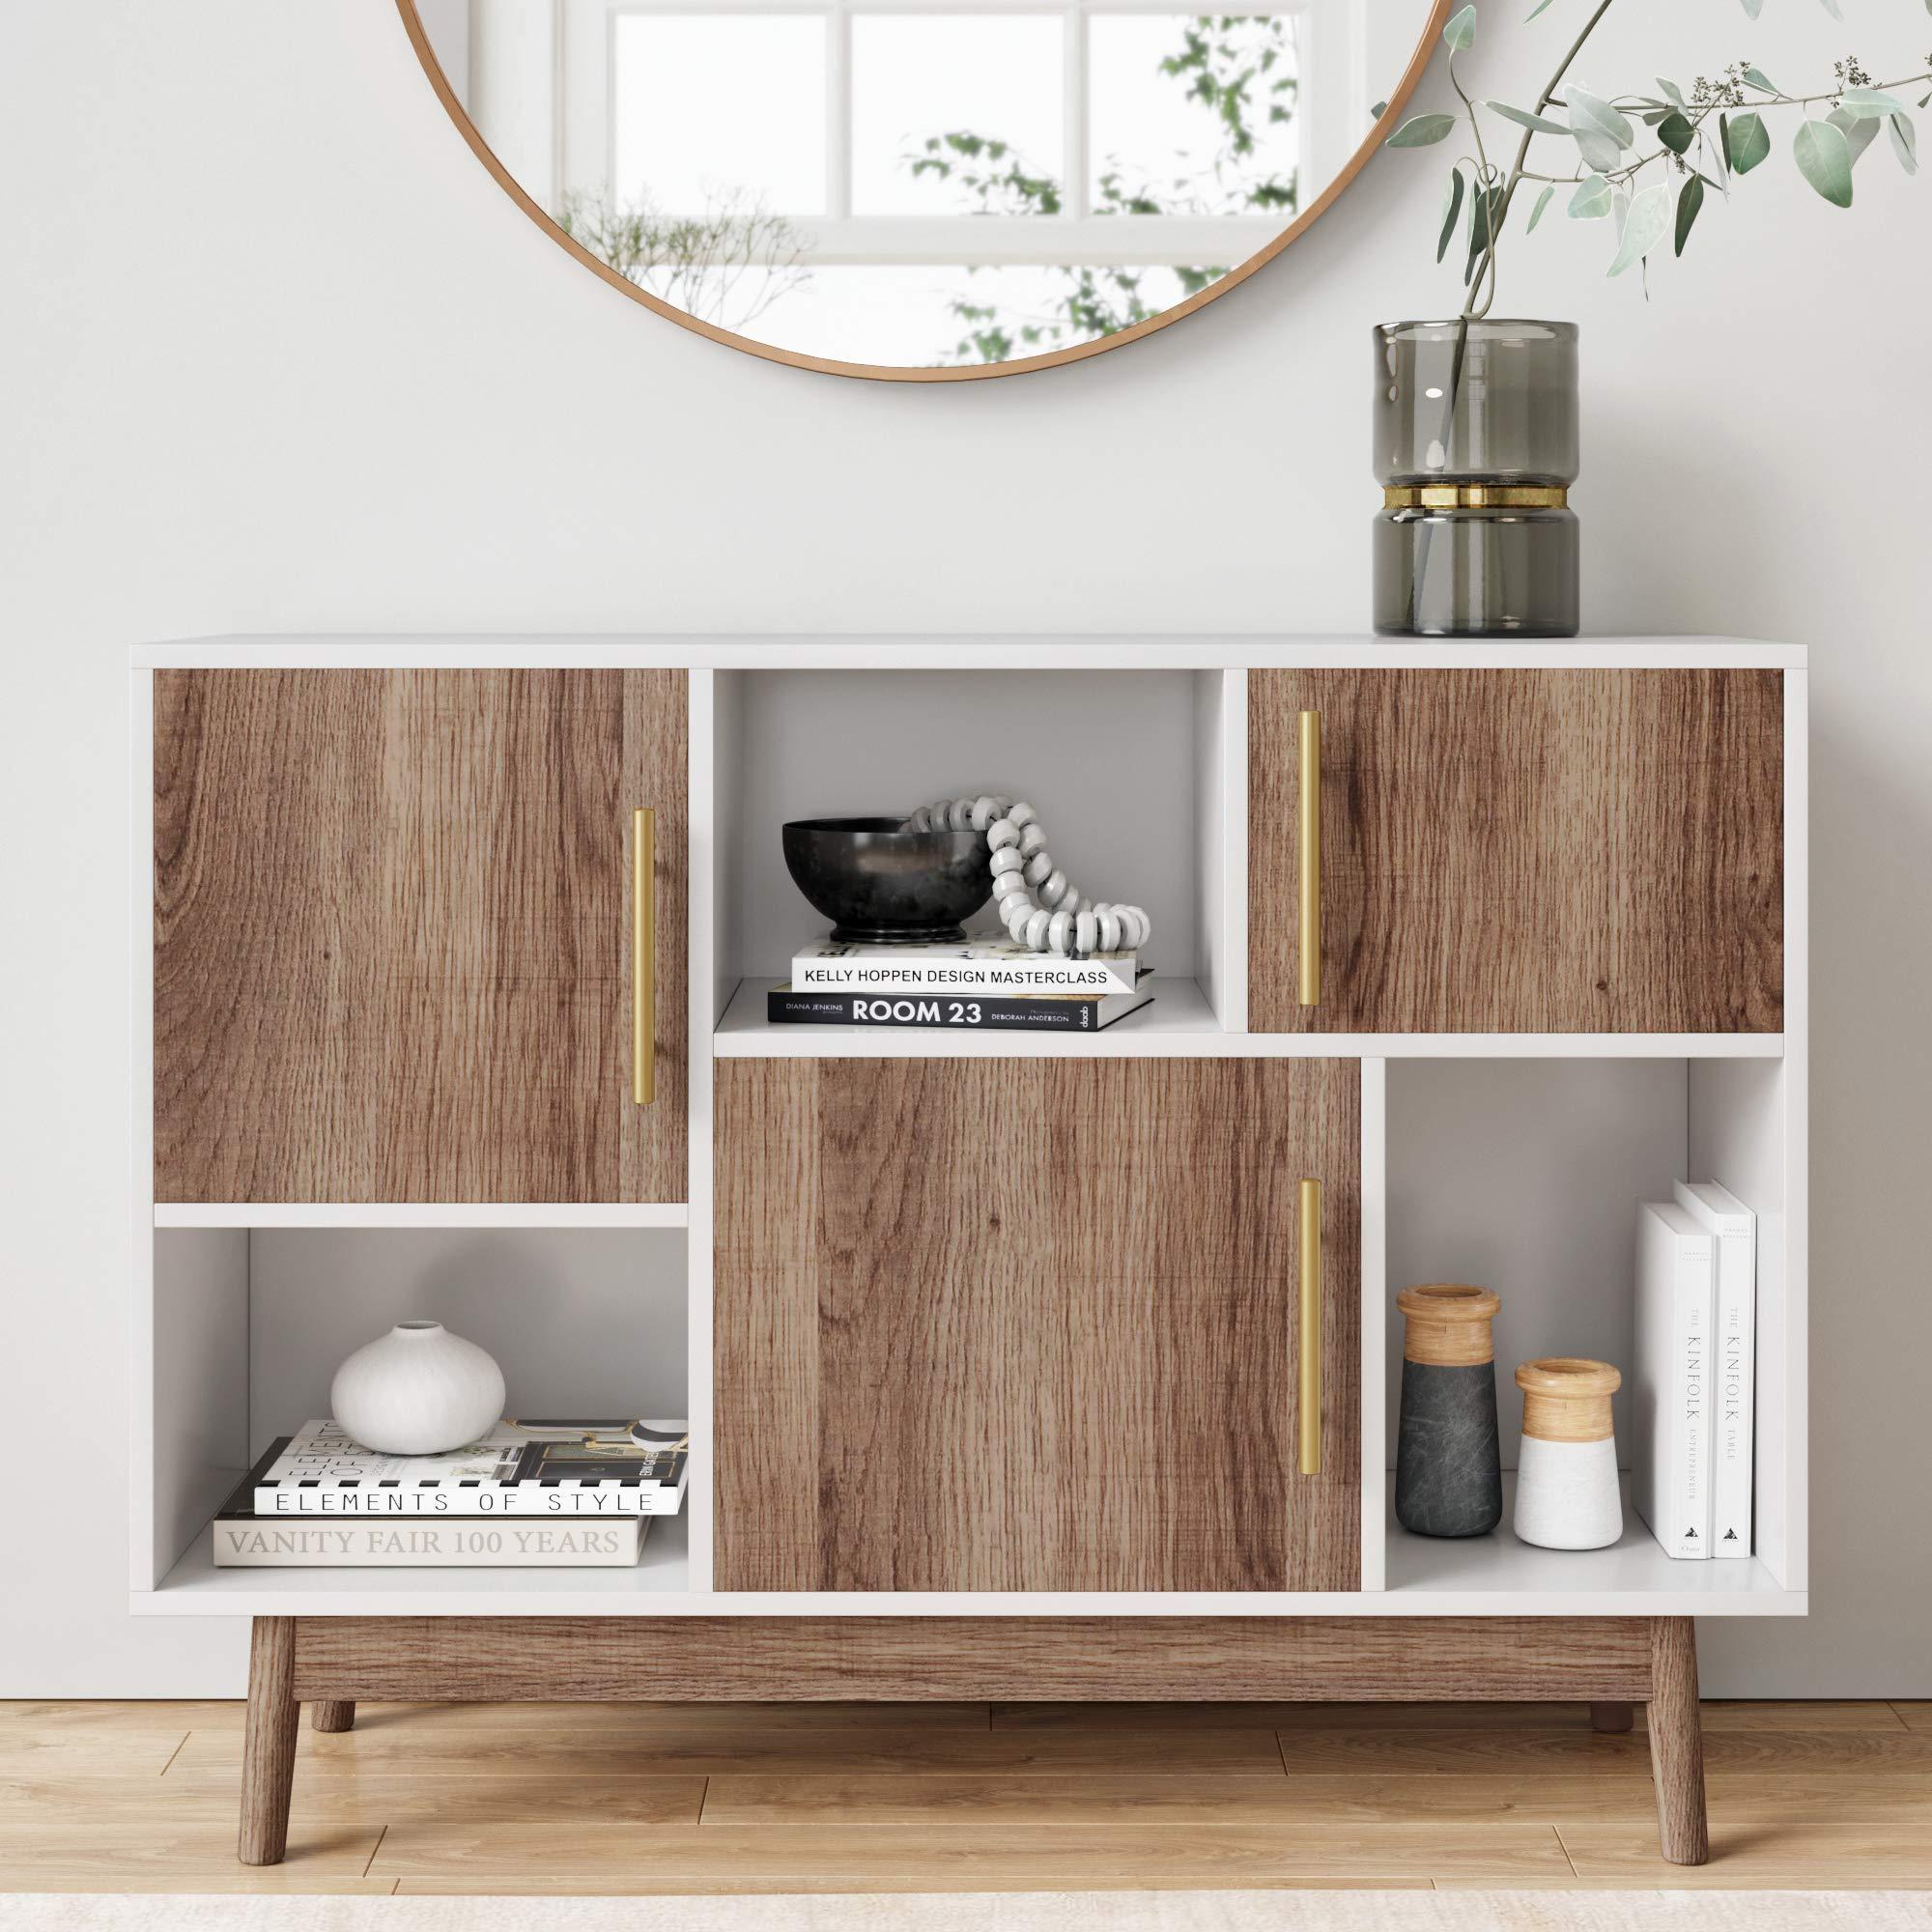 Nathan James 75501 Ellipse Modern Multipurpose Display Storage Unit Entryway Furniture, White by Nathan James